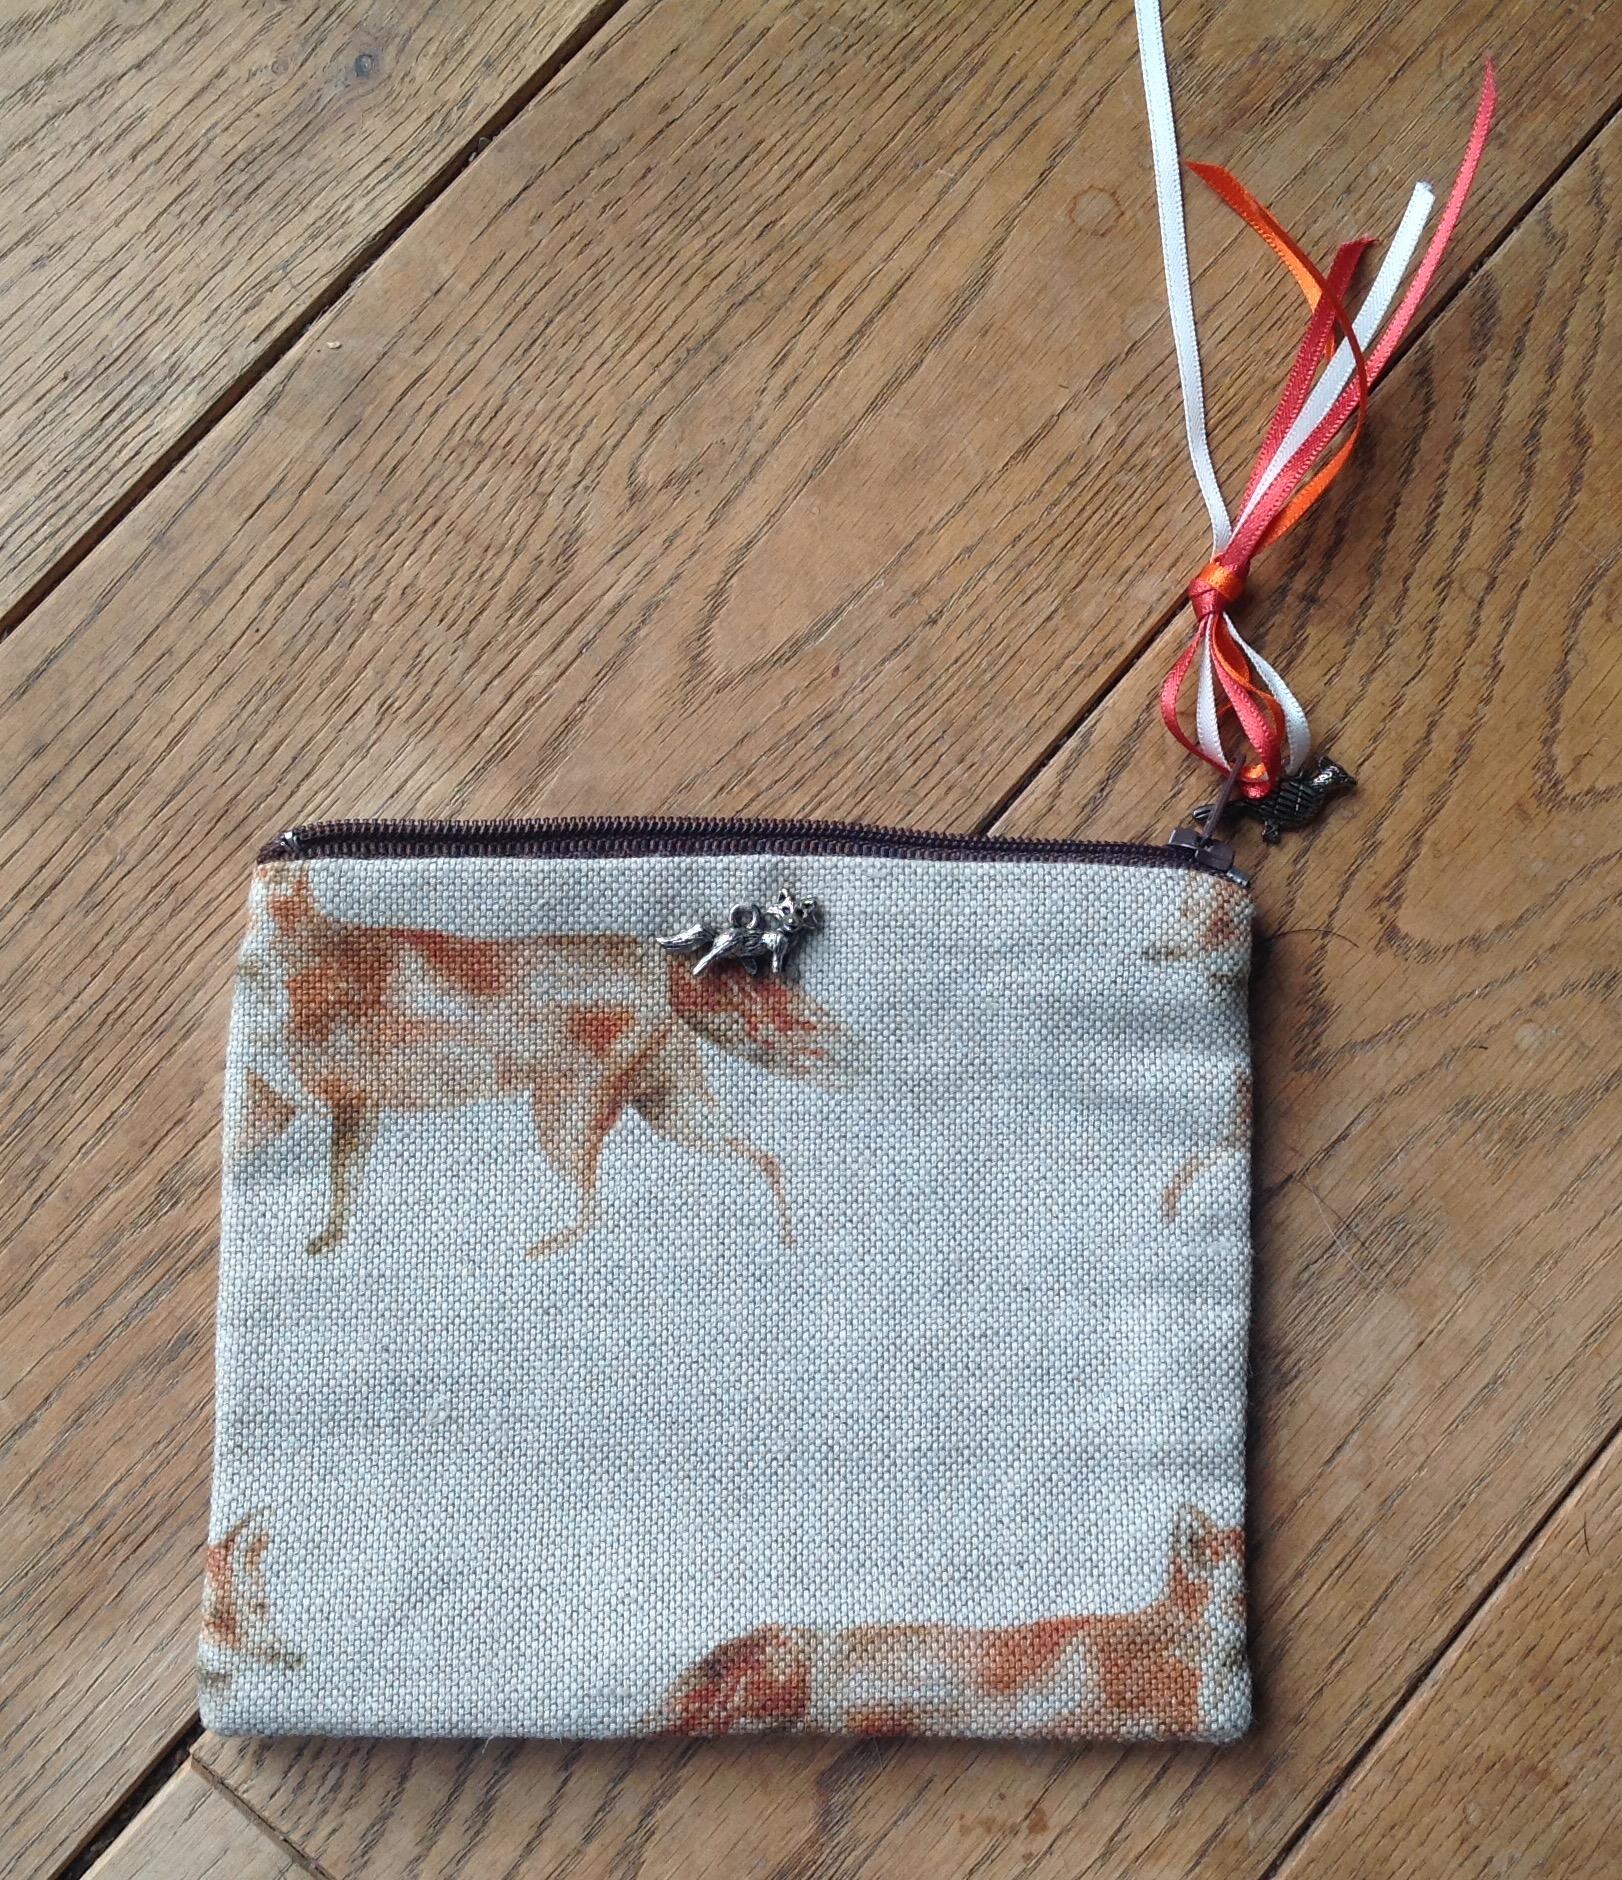 Coin purse - Voyage fox design